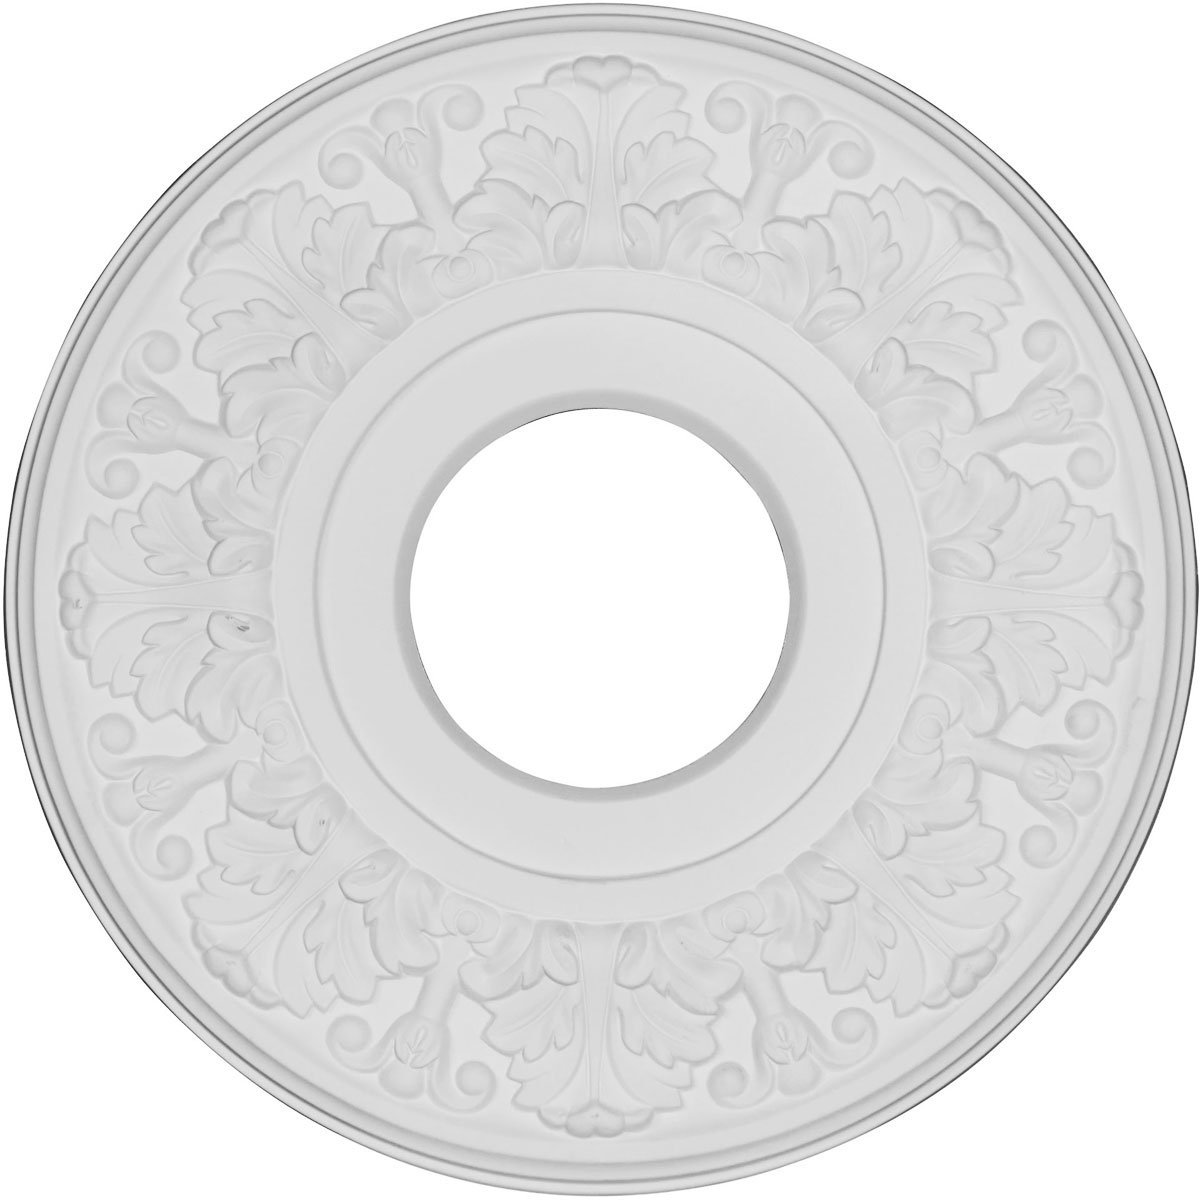 Ekena Millwork CMR12AP 11.5 x 3.5 x 1 in. Apollo Ceiling Medallion Primed